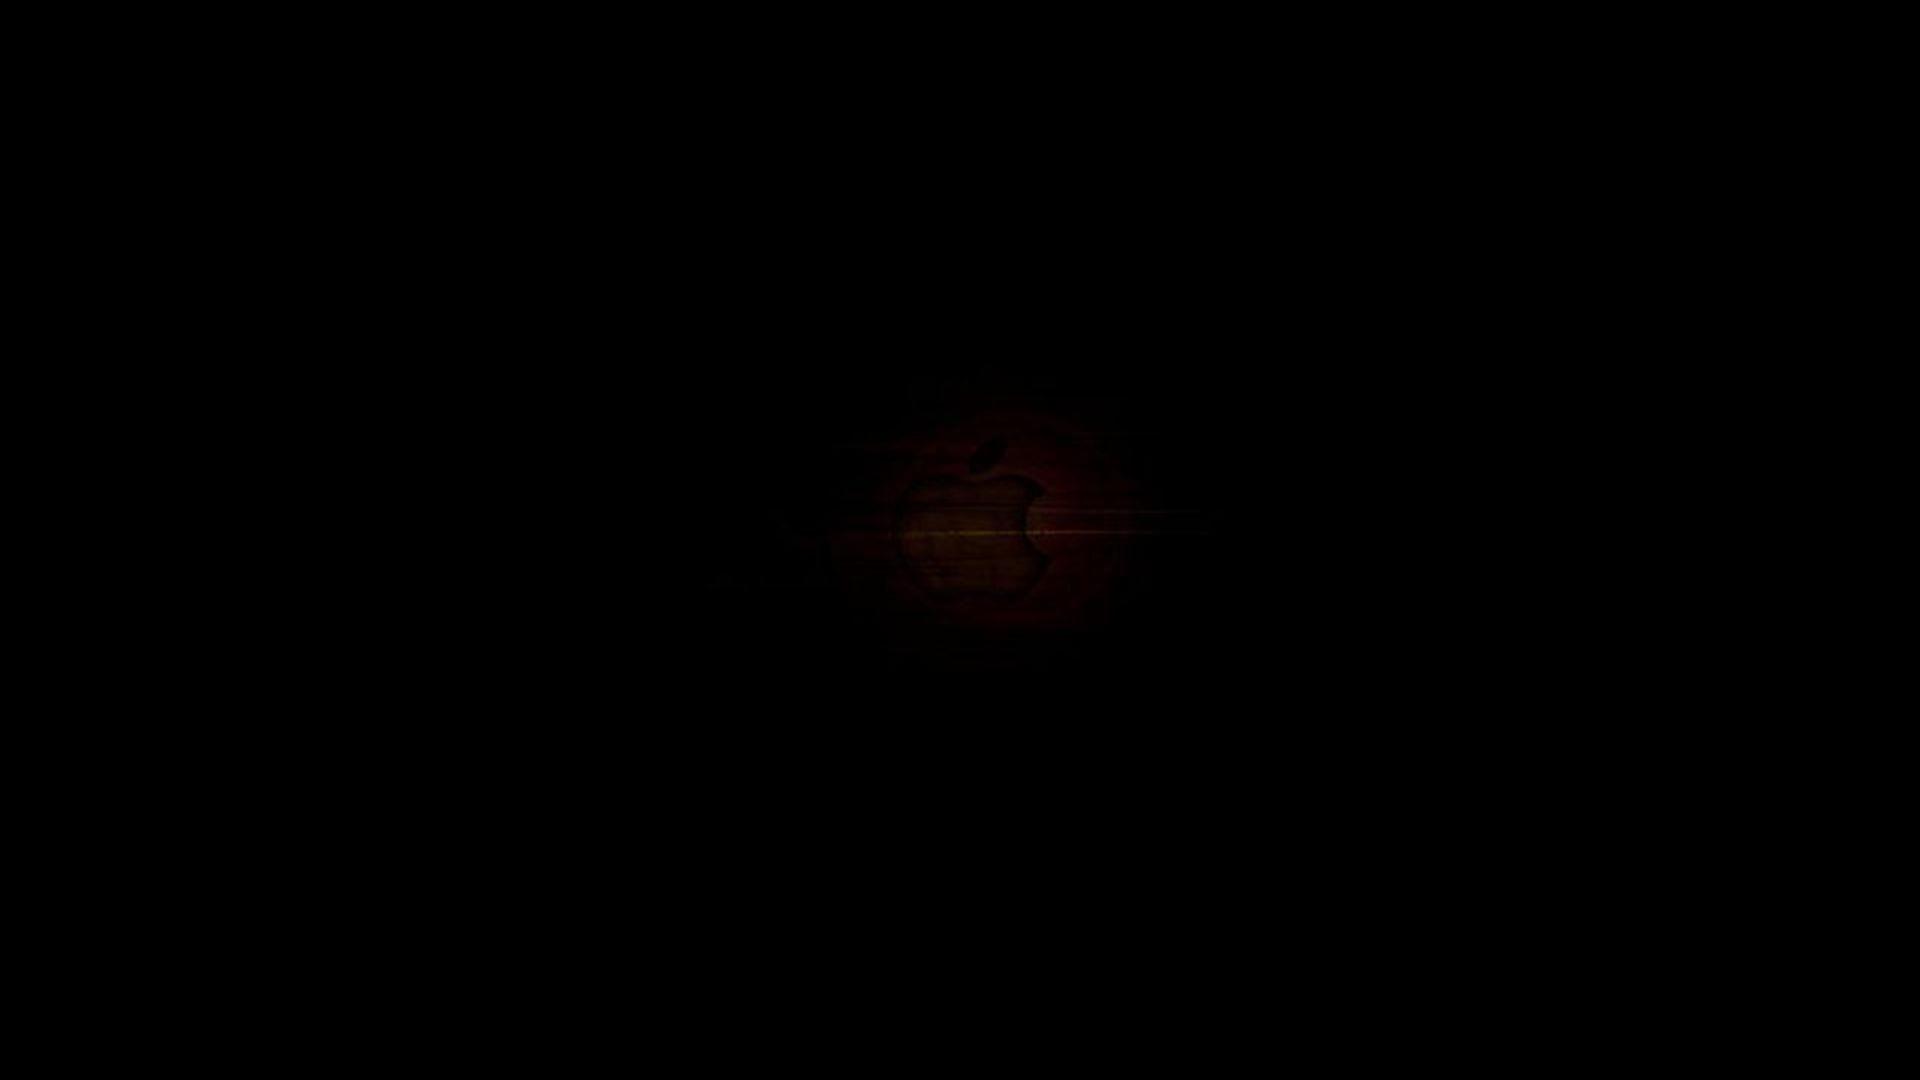 dark music wallpaper widescreen - drive.cheapusedmotorhome